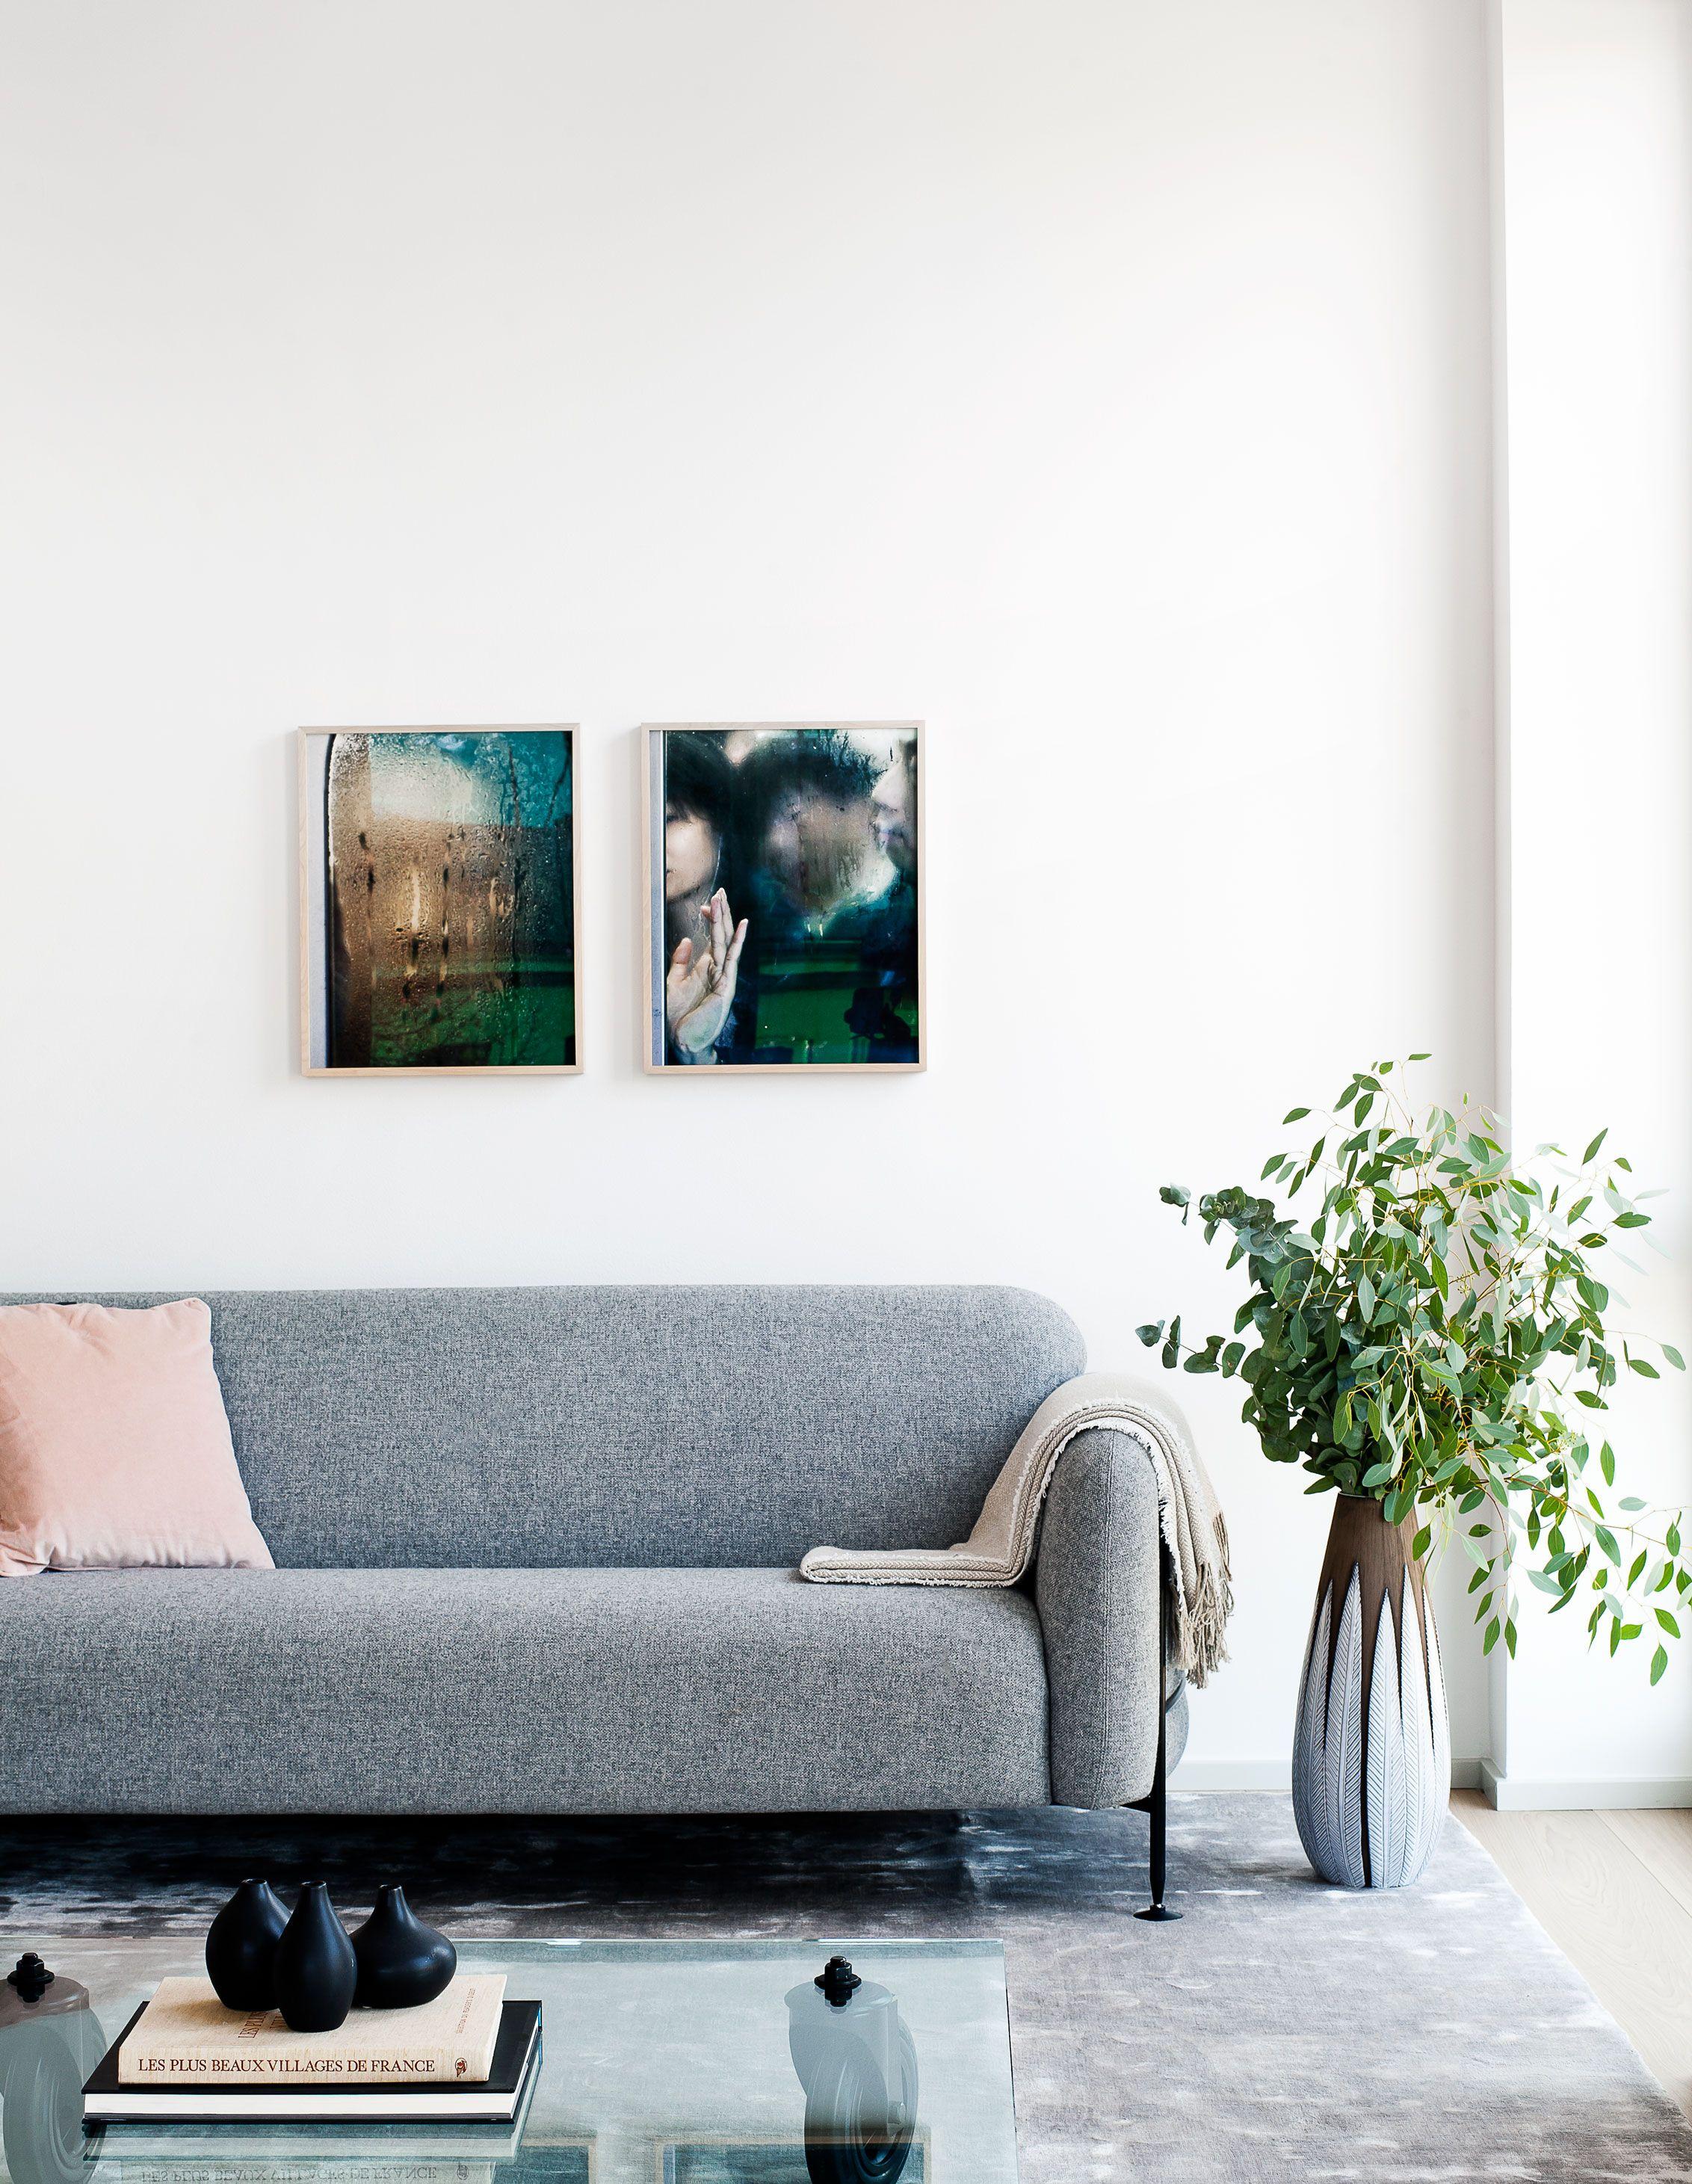 Attractive Oscar Properties: Lyceum Zootomiska #oscarproperties Interior, Design,  Architecture, Inspiration, Living Room, Flowers, Pots, Sofa, Grey Sofa, Art